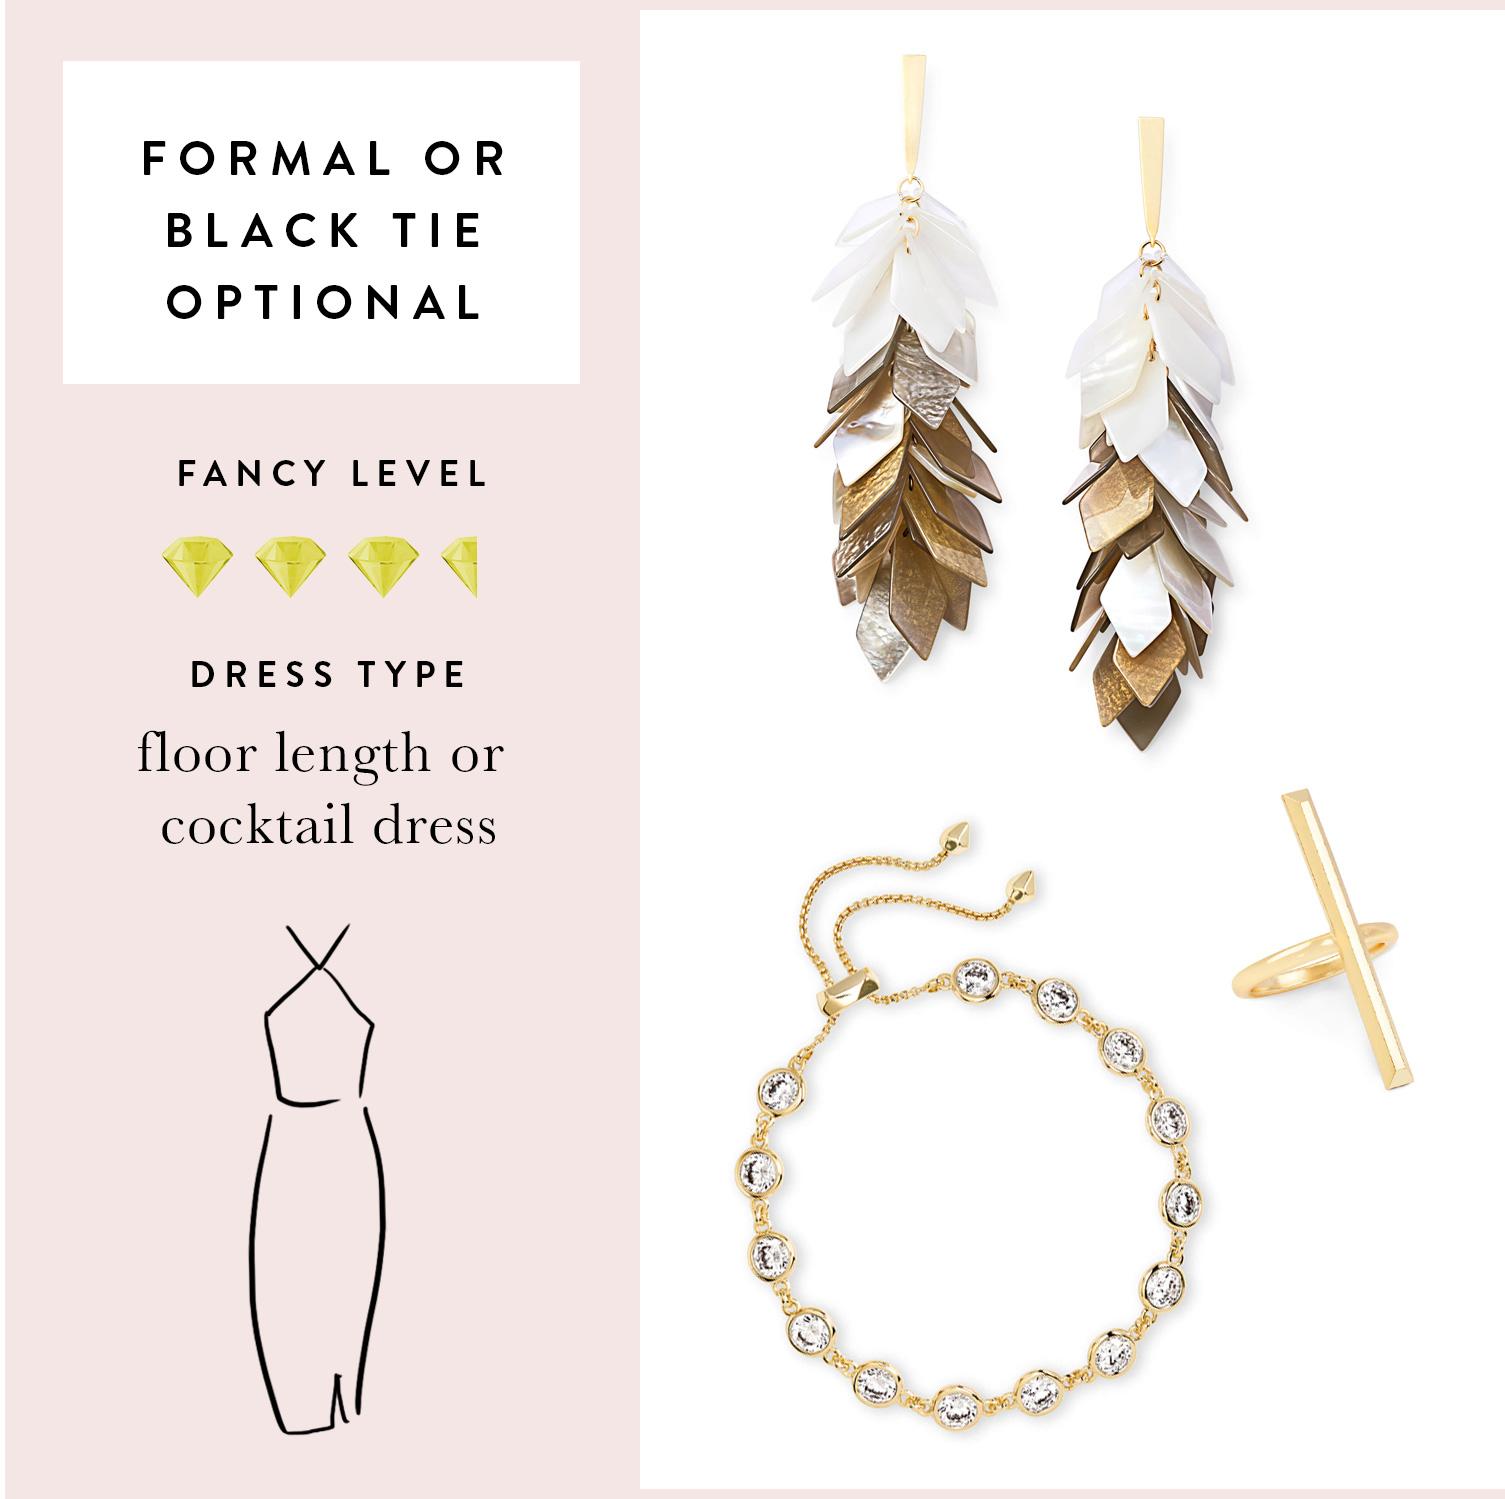 Jennifer Statement Earrings, Reggie Cocktail Ring, Charlize Link Bracelet